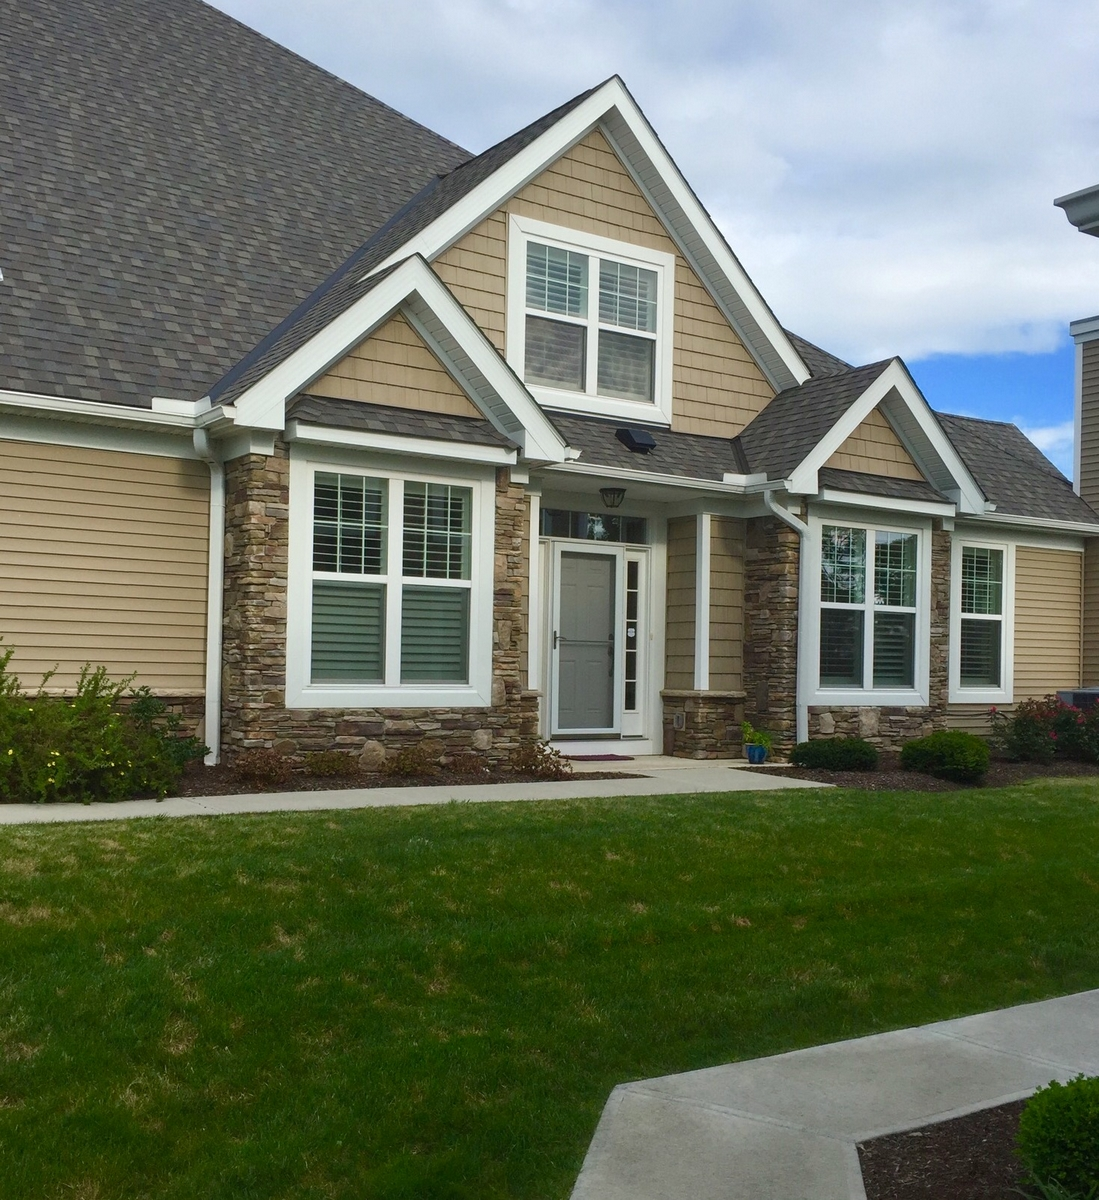 Condominium for Sale at 4748 Tradewinds Drive Port Clinton, Ohio 43452 United States